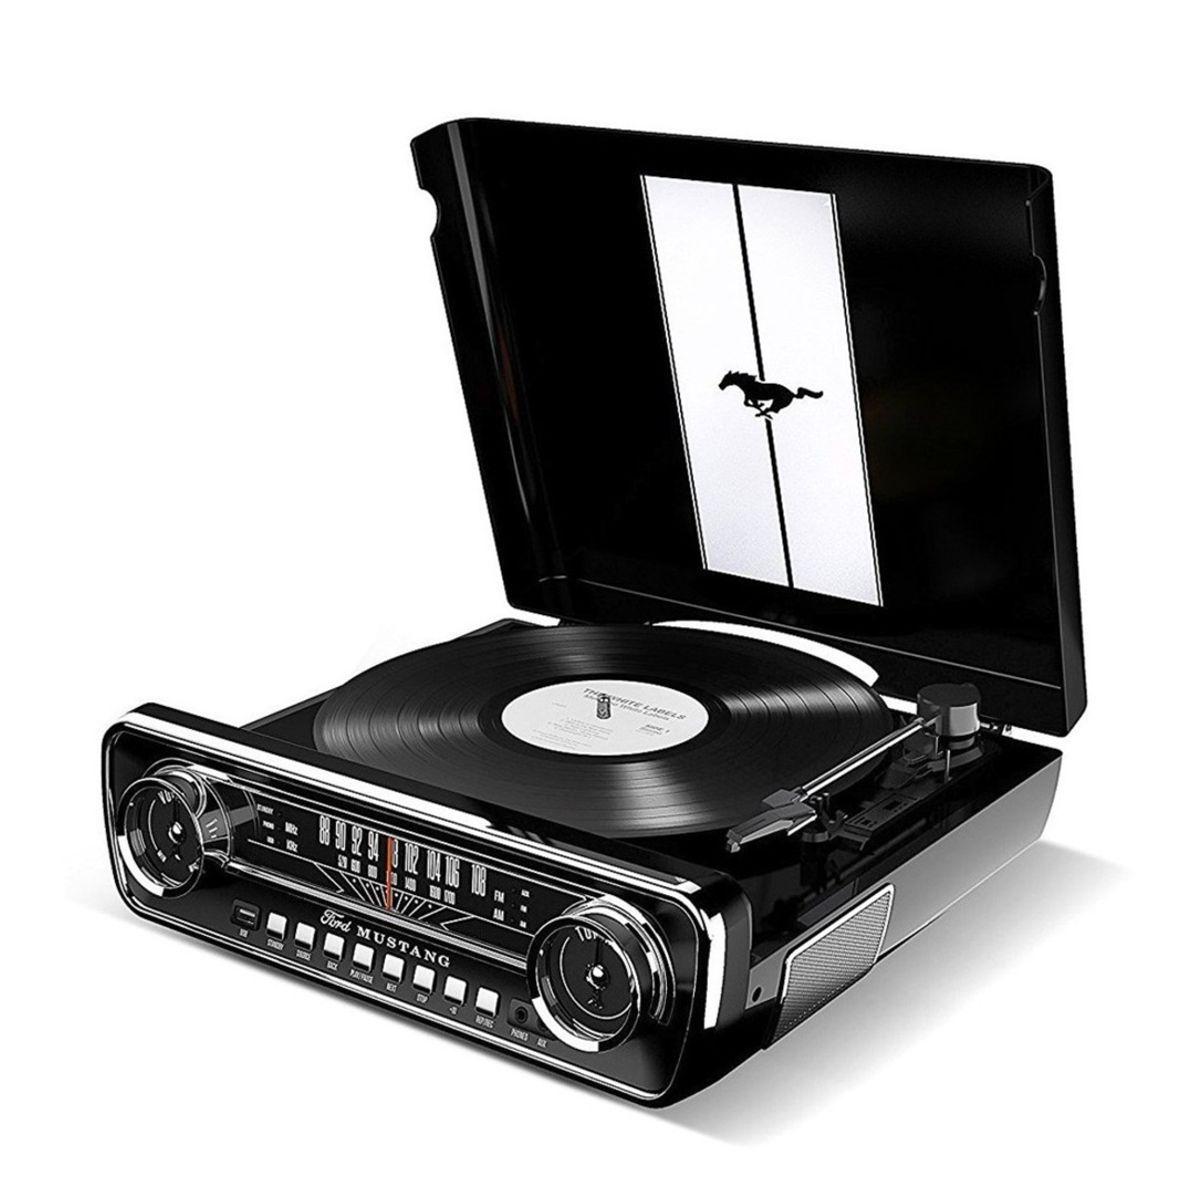 Toca Discos 4 em 1 Retrô Music Center - Mustang LP ION Audio